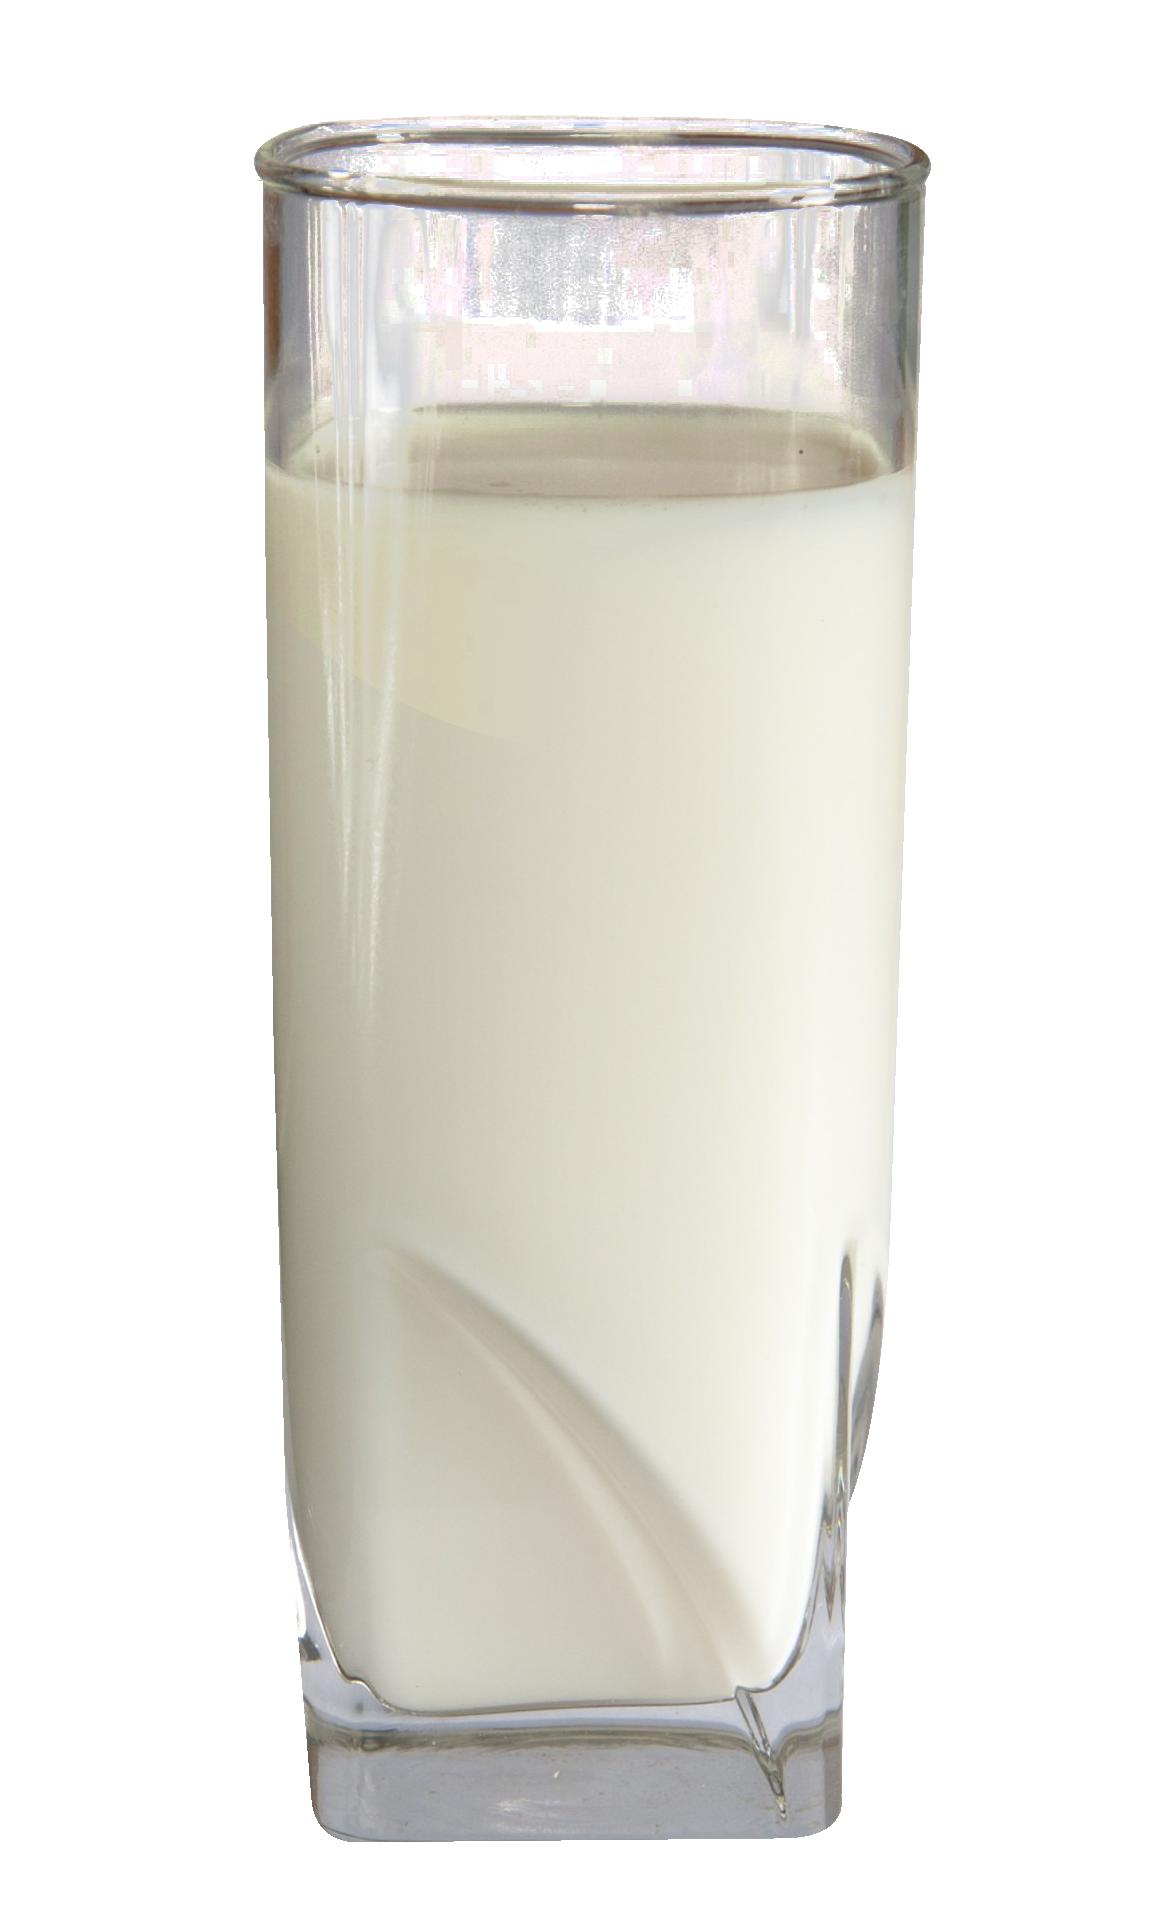 Clipart milk raw milk. Glass png image purepng